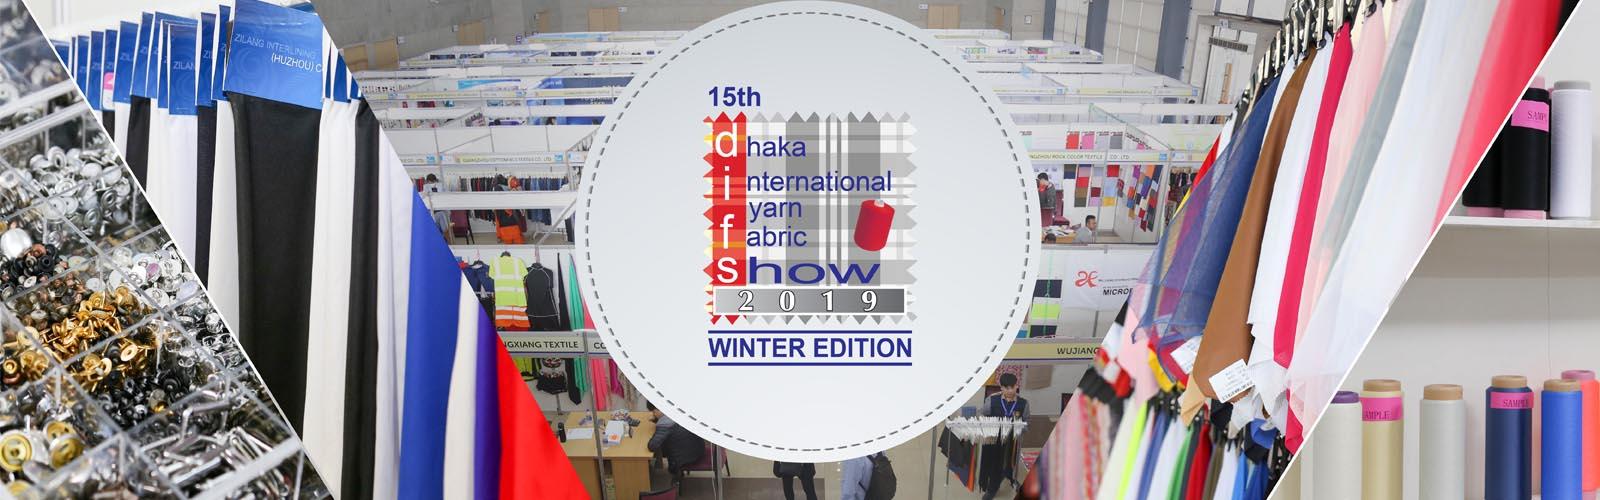 15th Dhaka International Yarn & Fabric Show 2019—Winter Edition